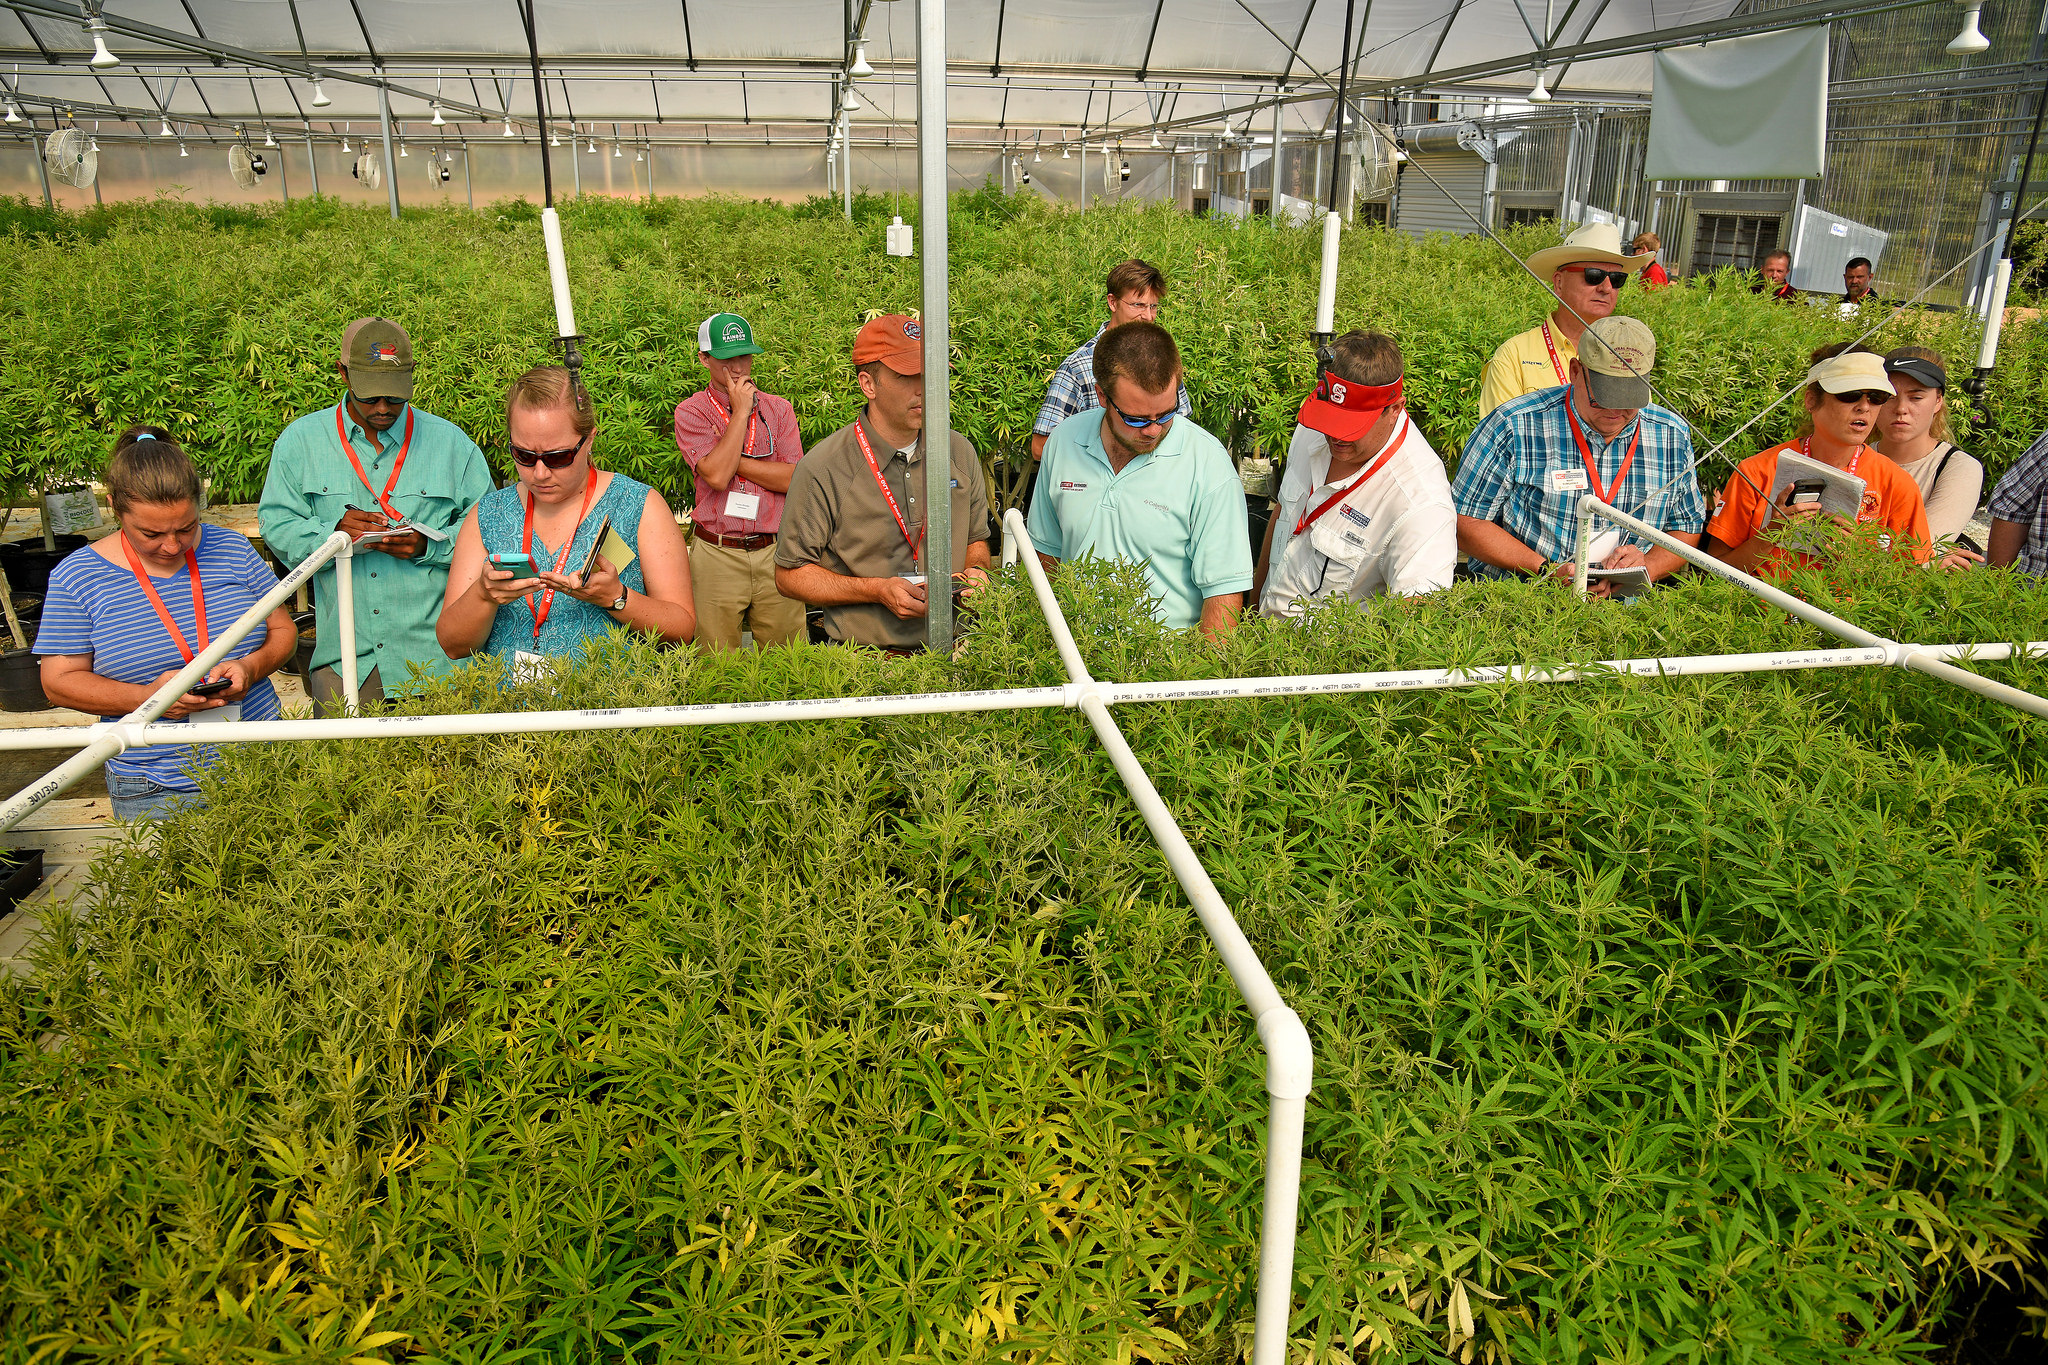 Tour group in hemp greenhouse